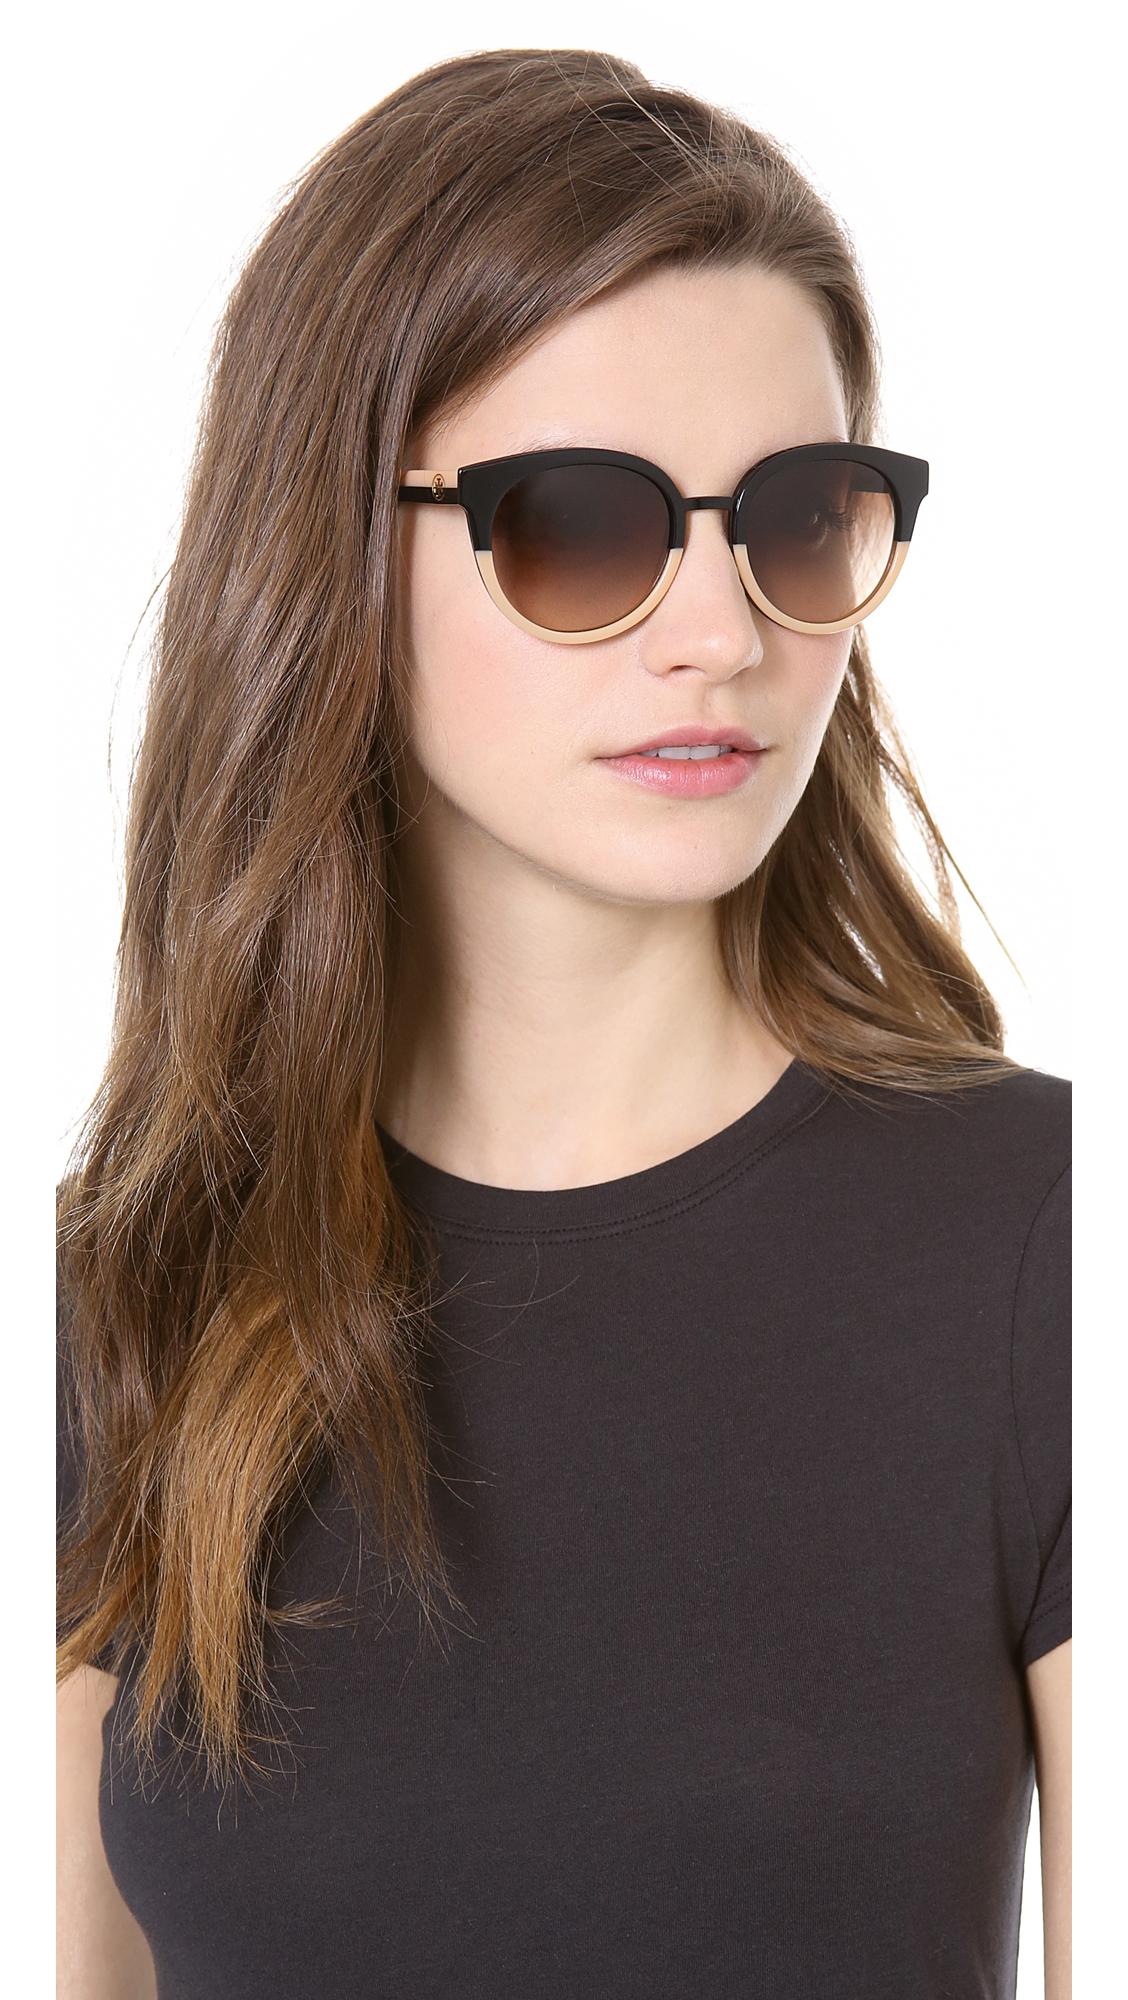 0aa3aacba4d0 Tory Burch Eclectic Sunglasses